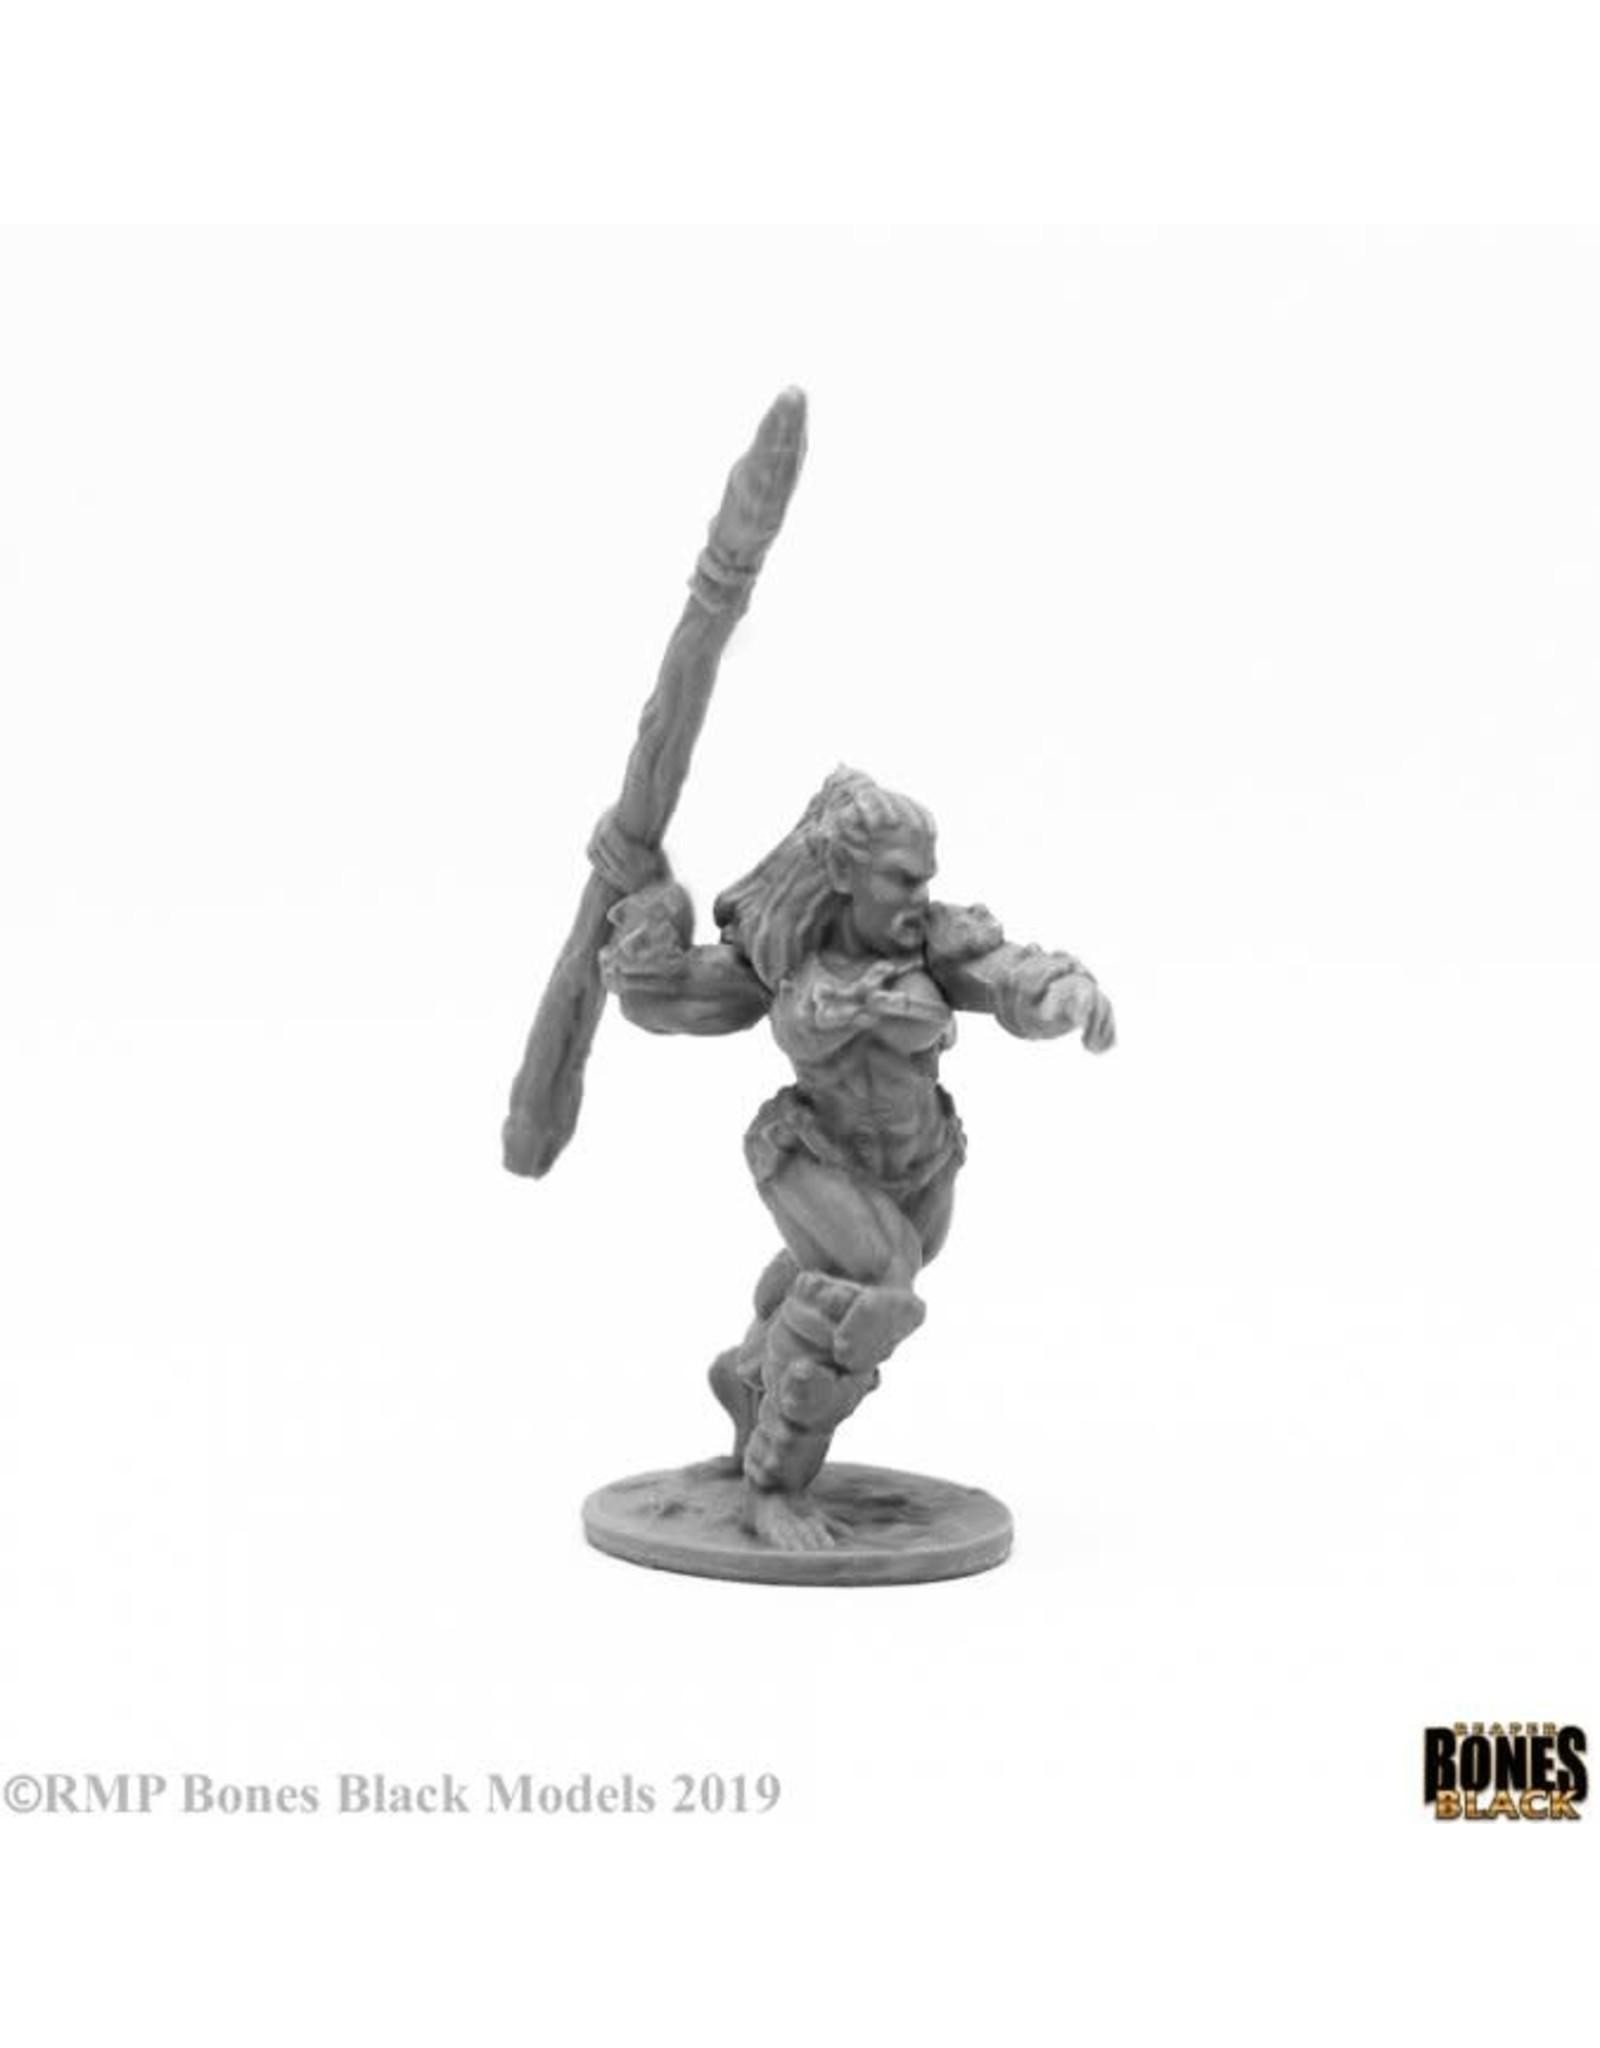 Reaper Miniatures Bones Black: Jade Fire Spearman